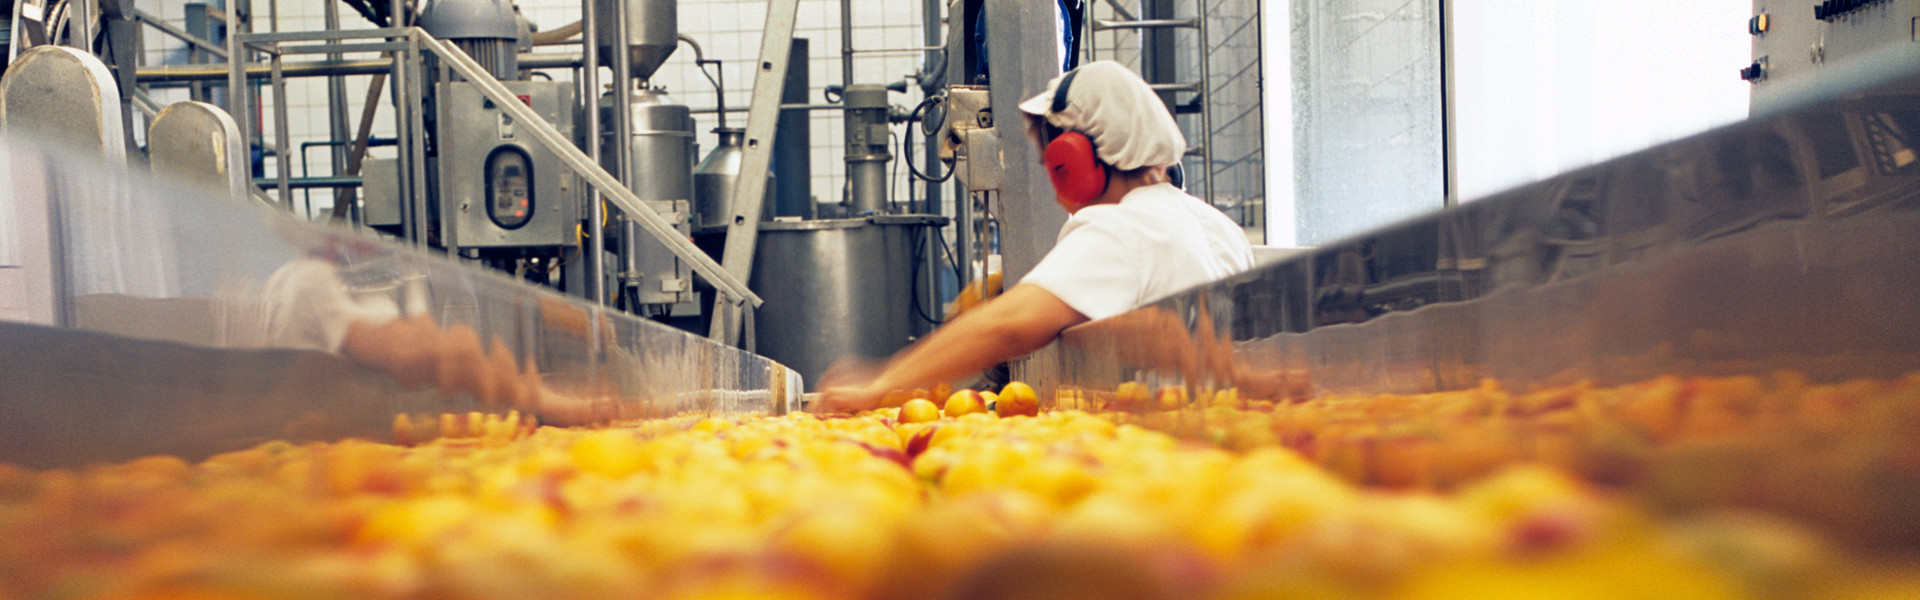 Voeding voedsel technologie